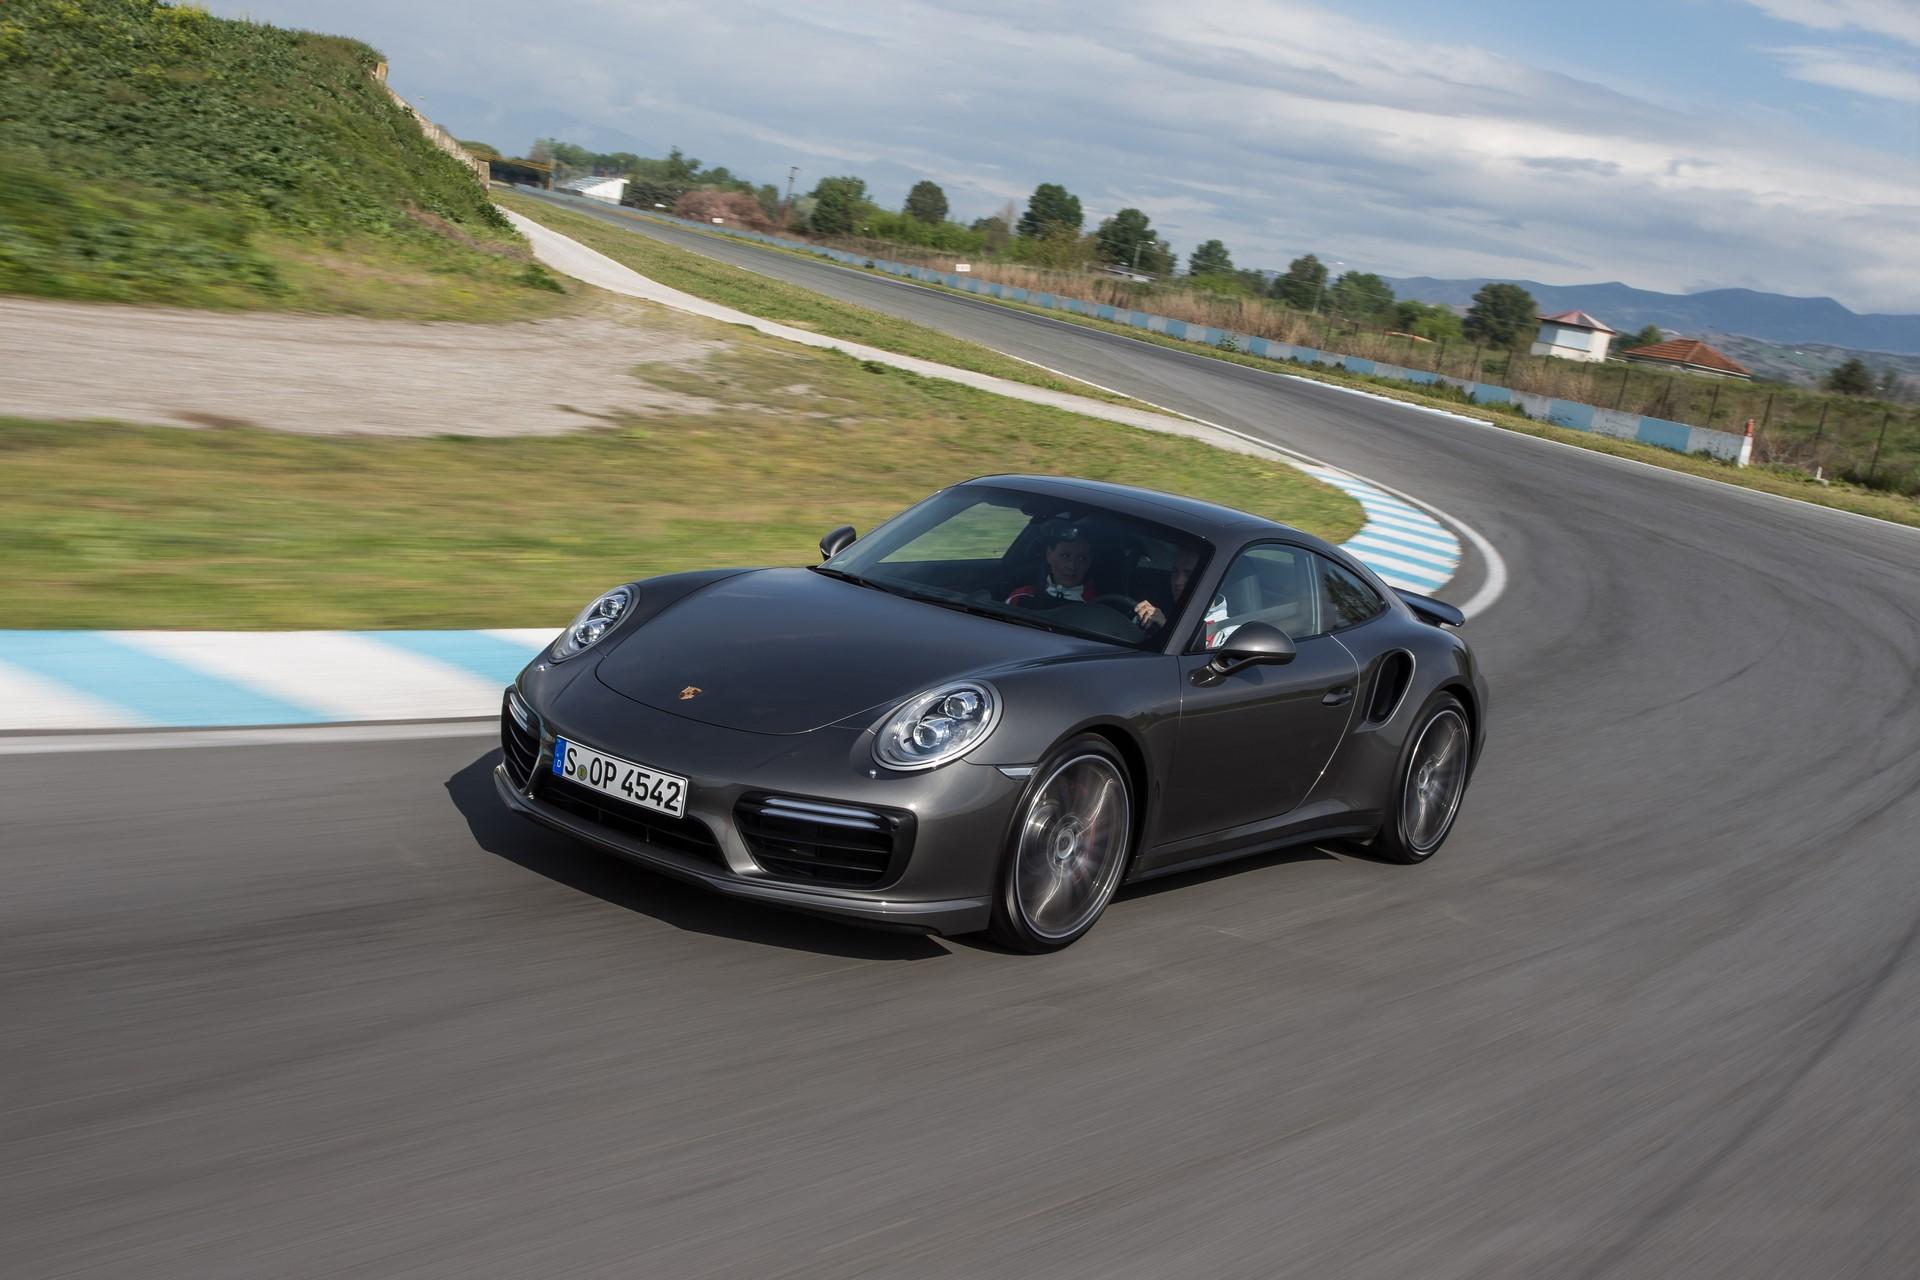 Porsche Driving Experience 2017 Serres (18)